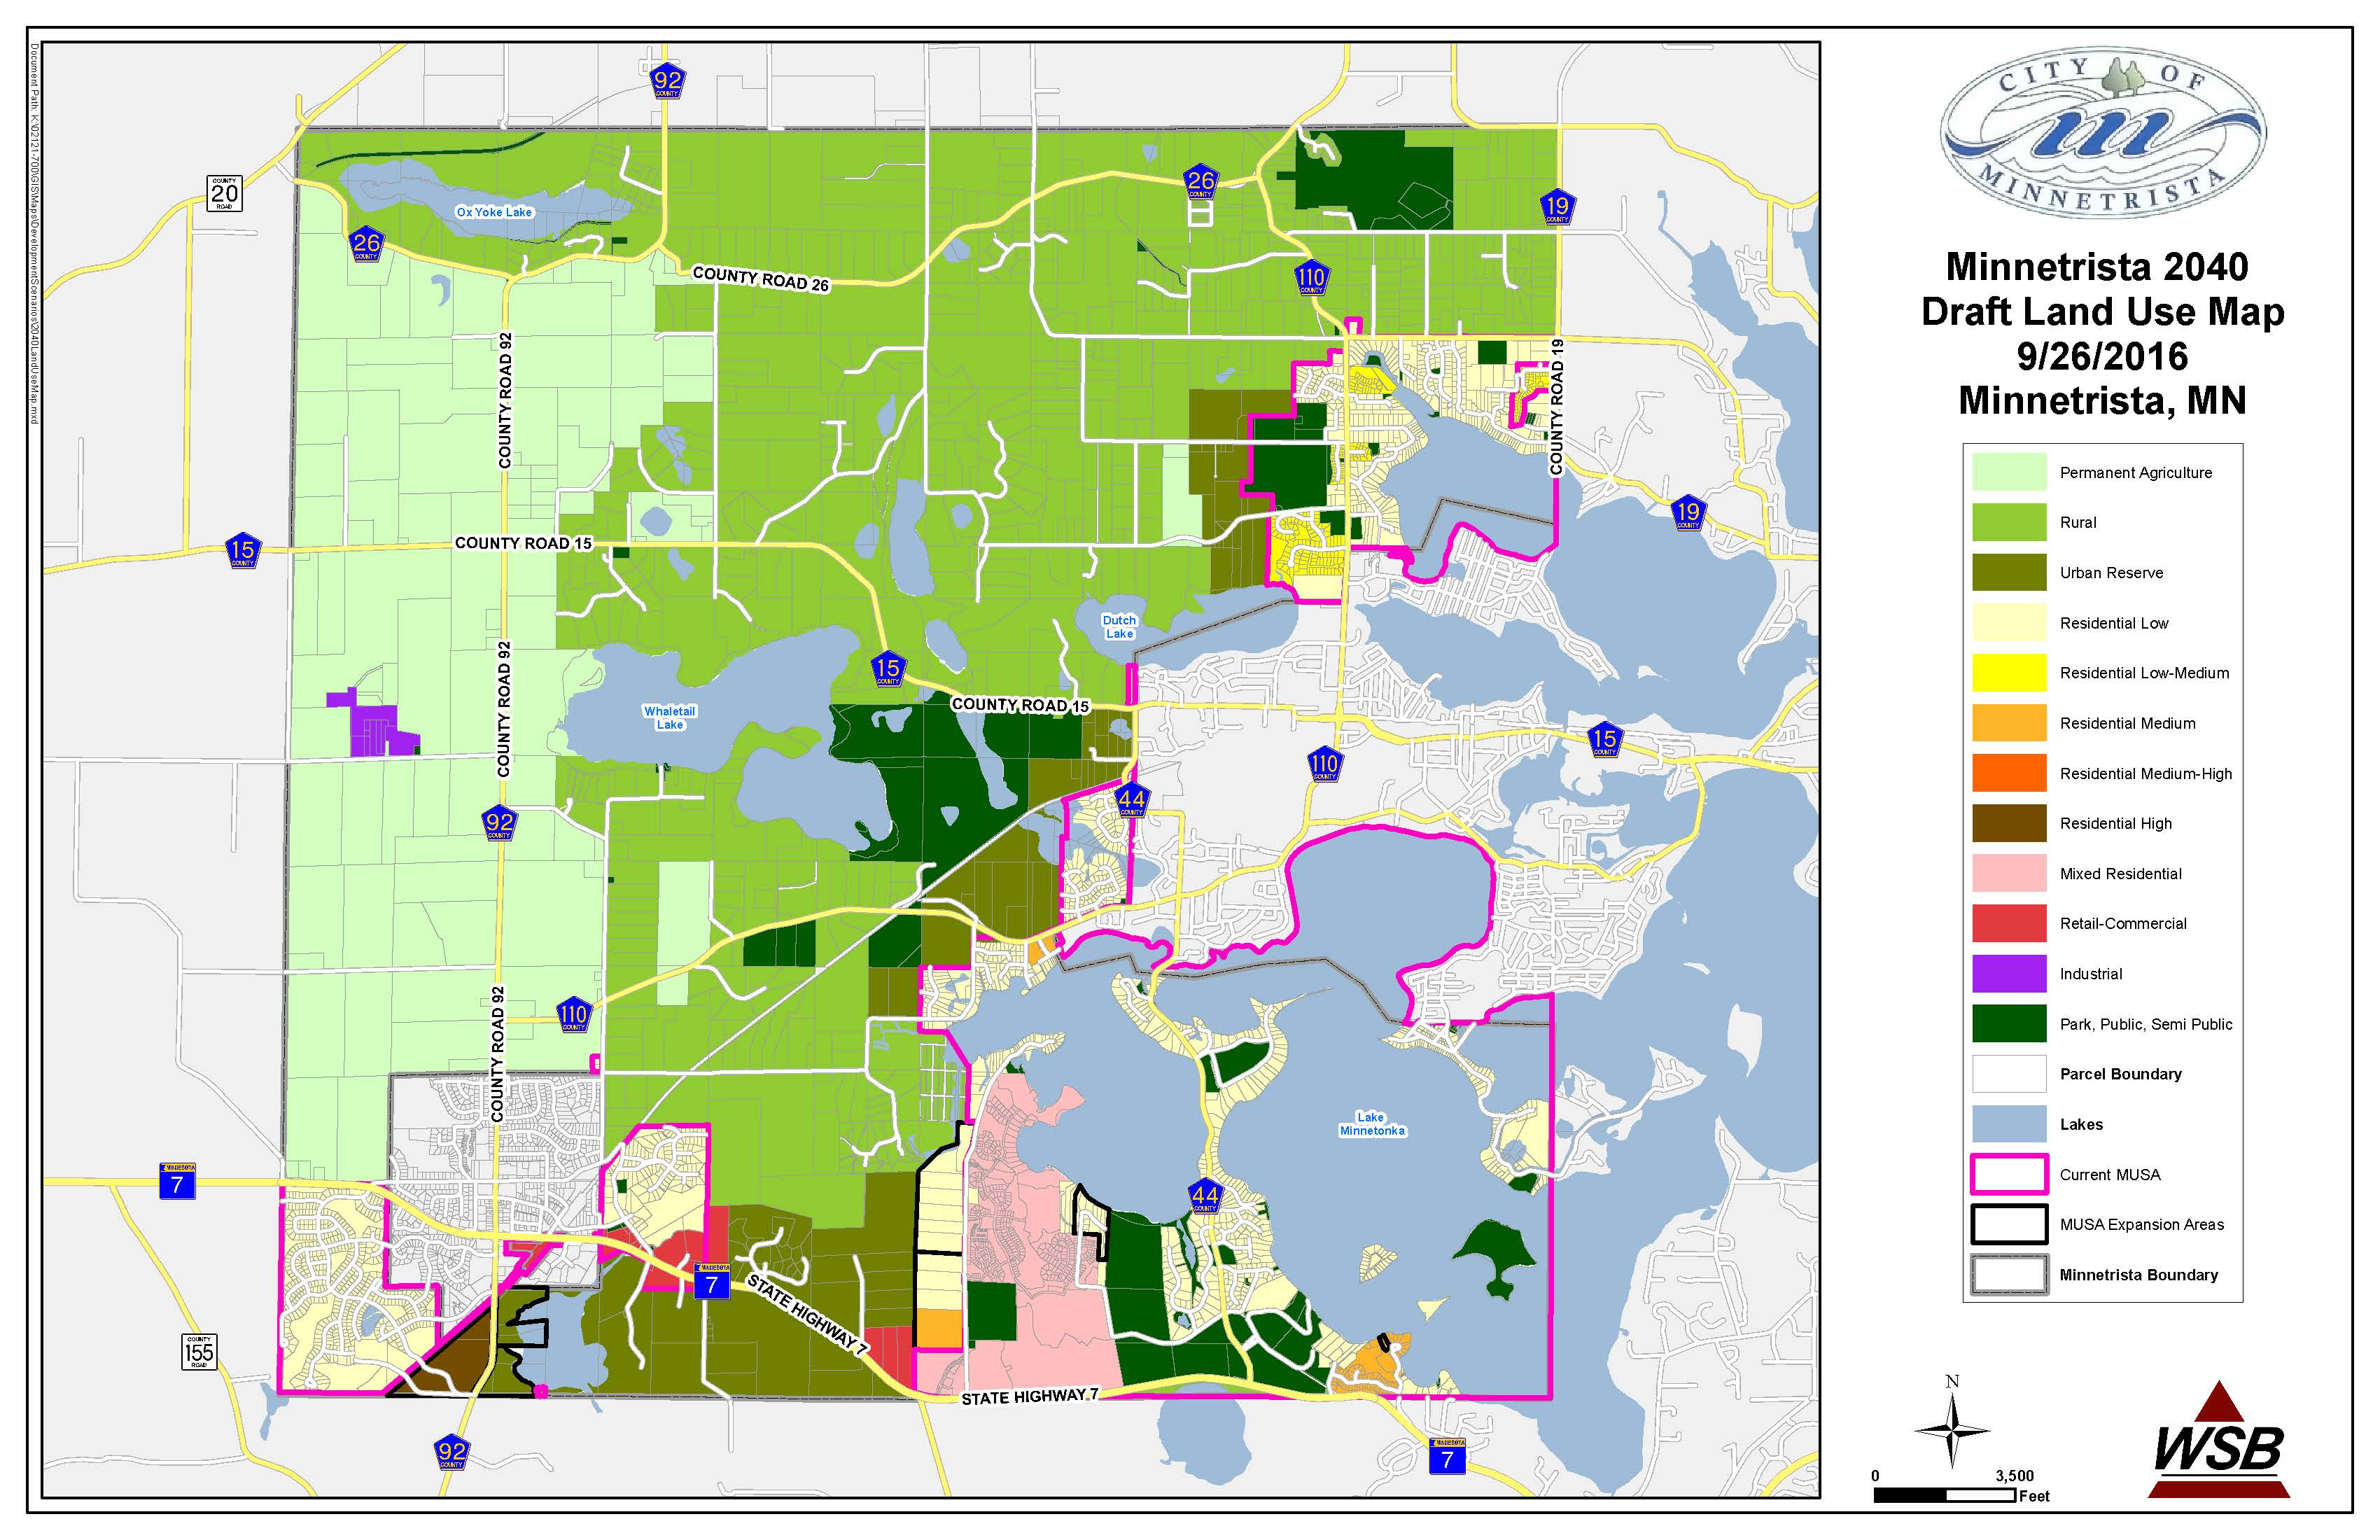 City Of Minnetrista Comprehensive Plan MySidewalk - Image of us map at 2040